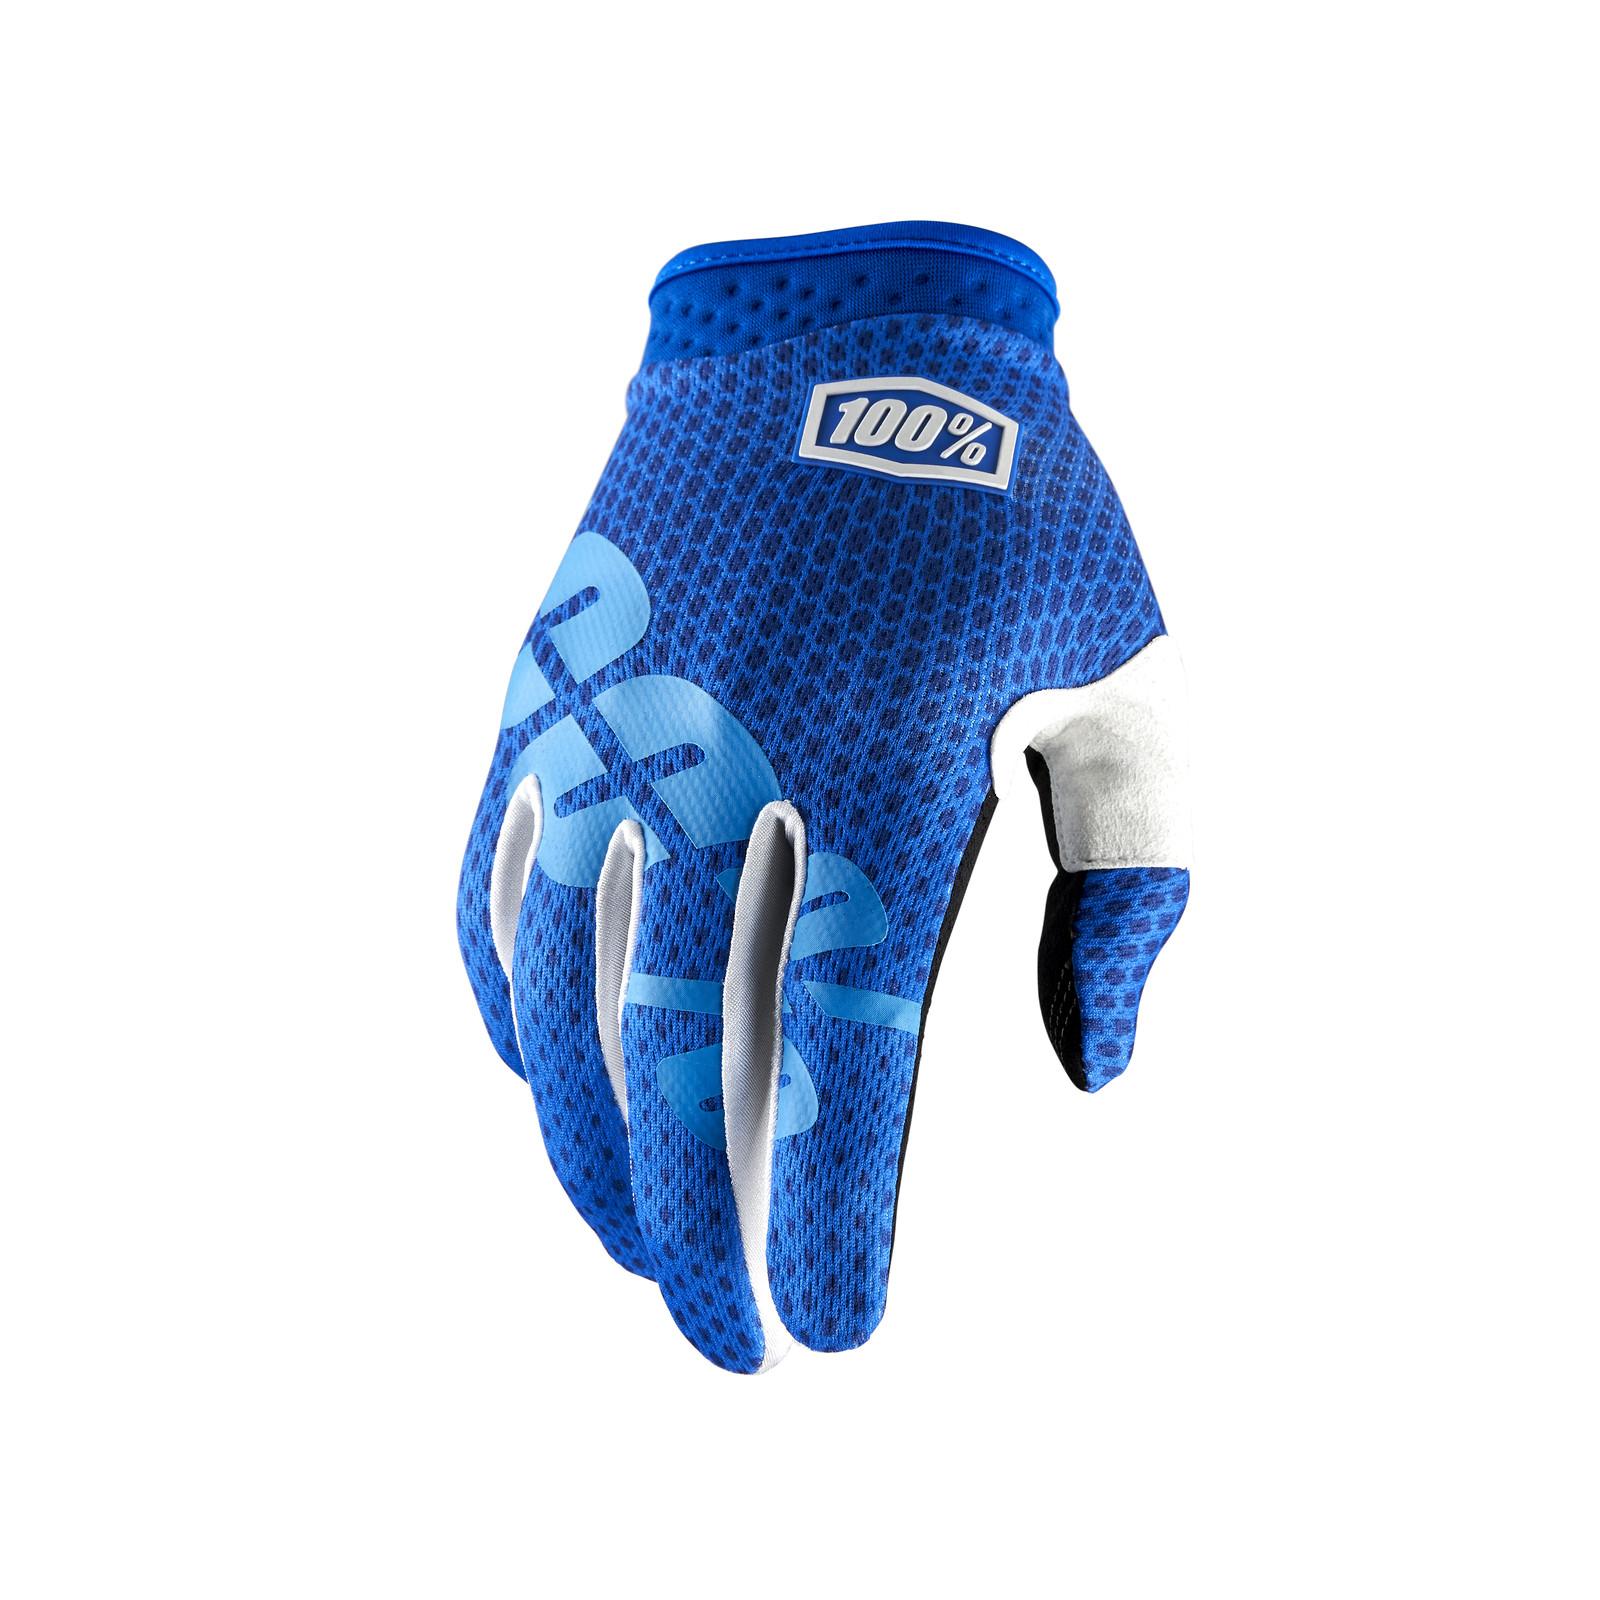 iTrack Glove - Blue - 100percent - Mountain Biking Pictures - Vital MTB